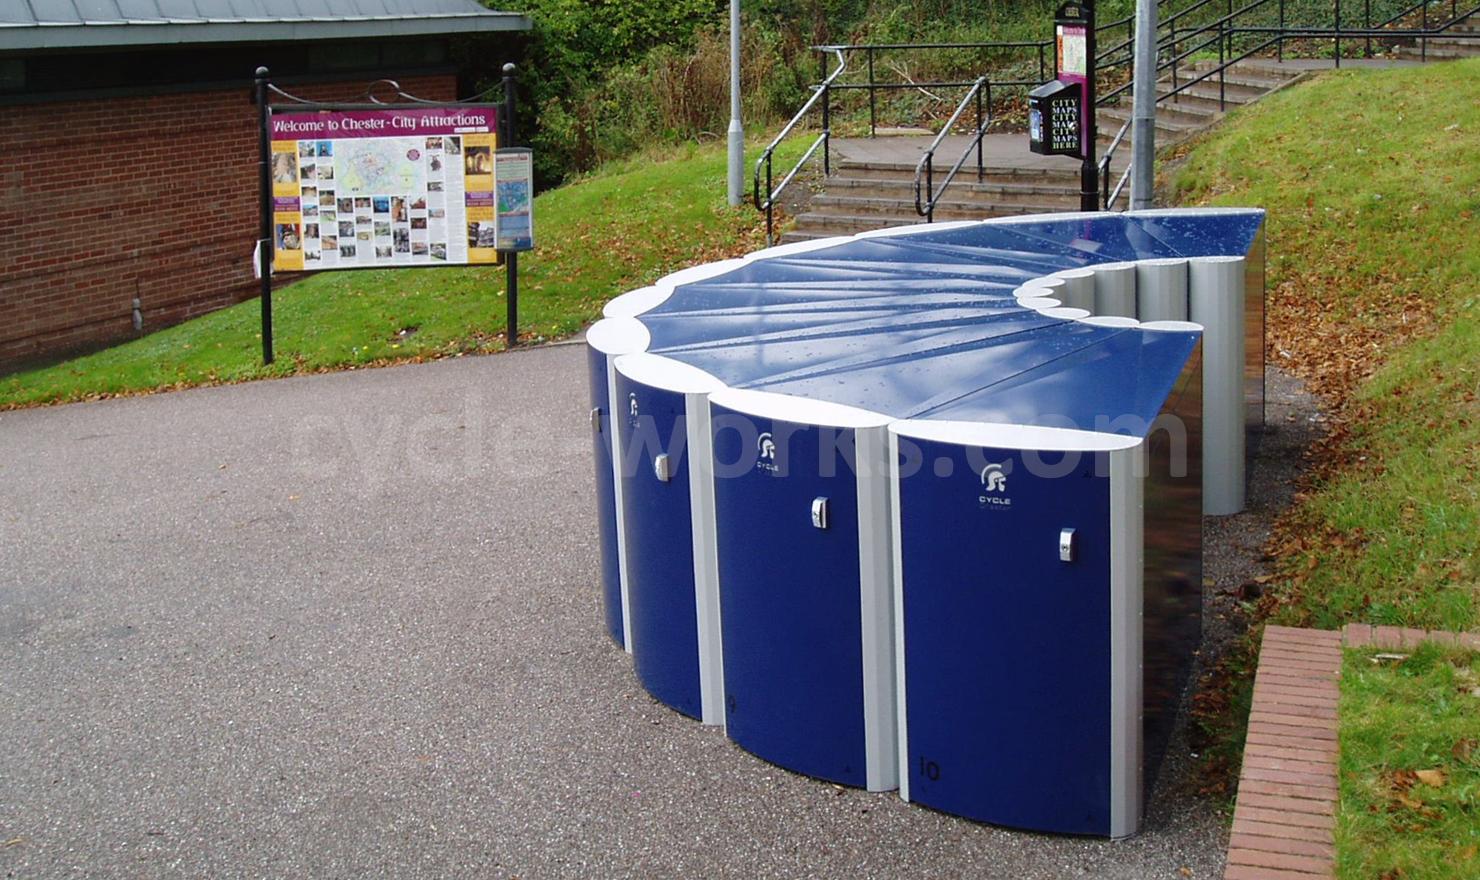 Chester Park and Ride Bike Locker